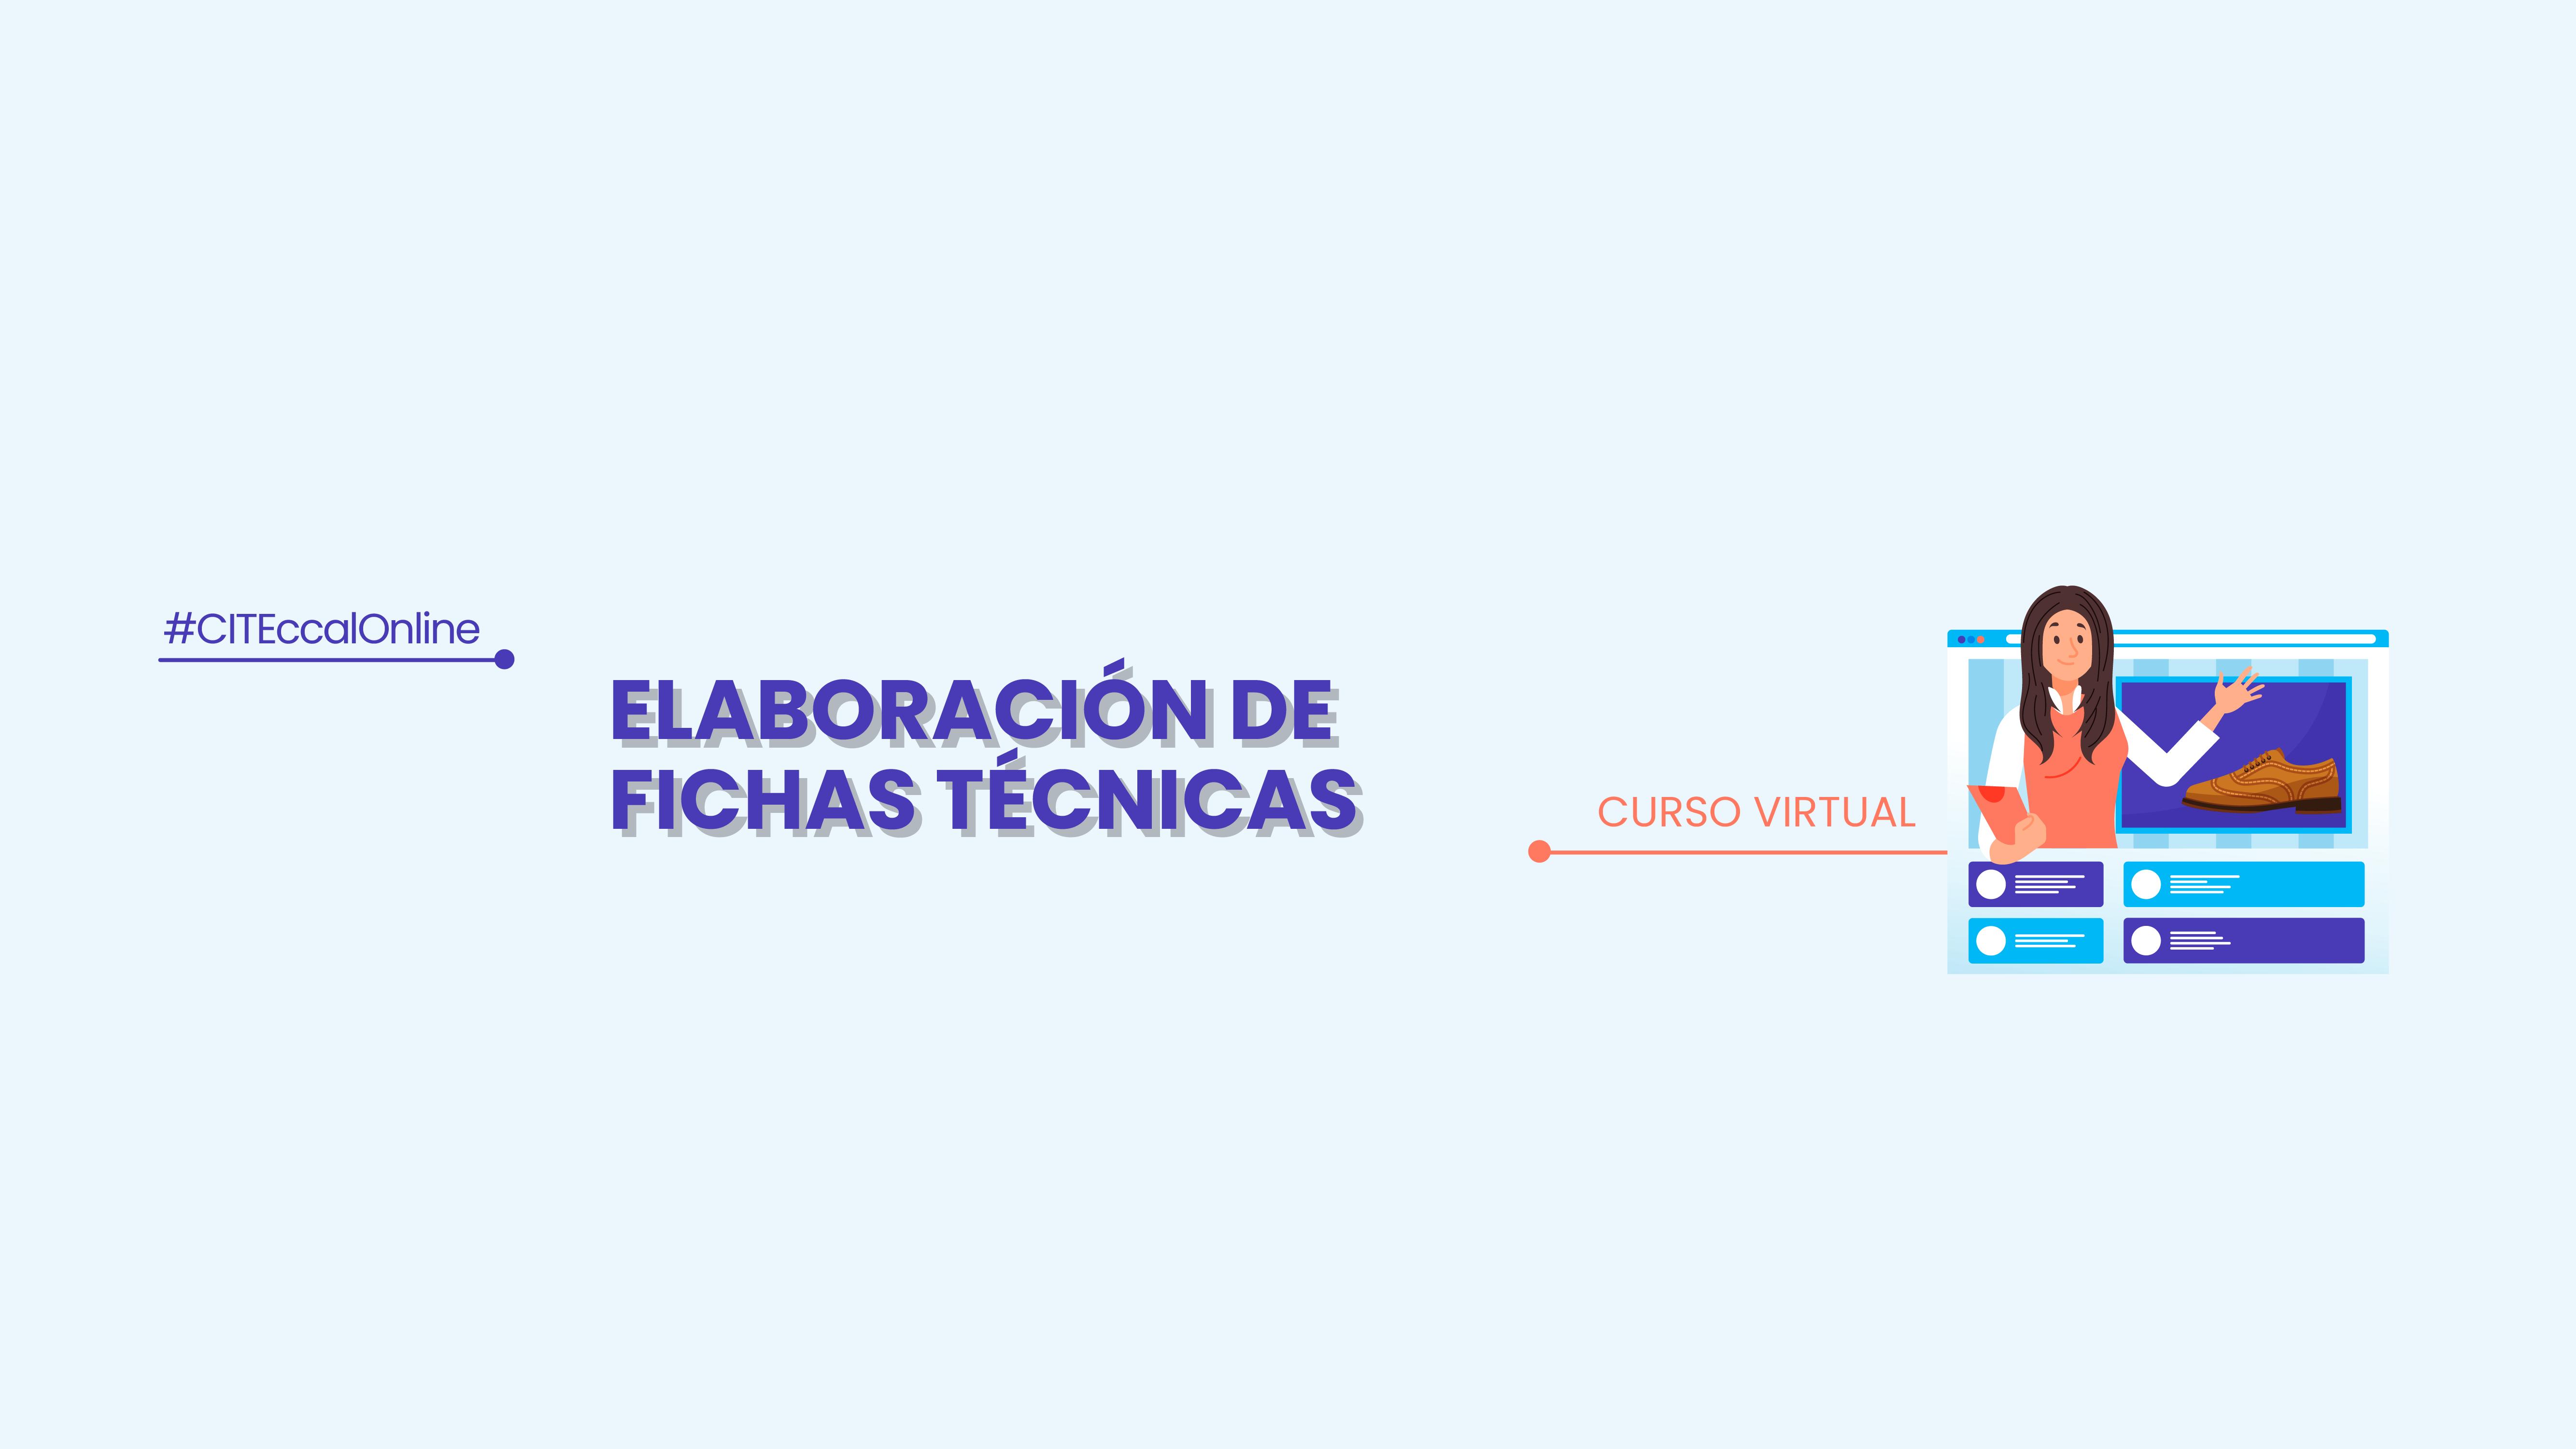 Elaboración de Fichas Técnicas